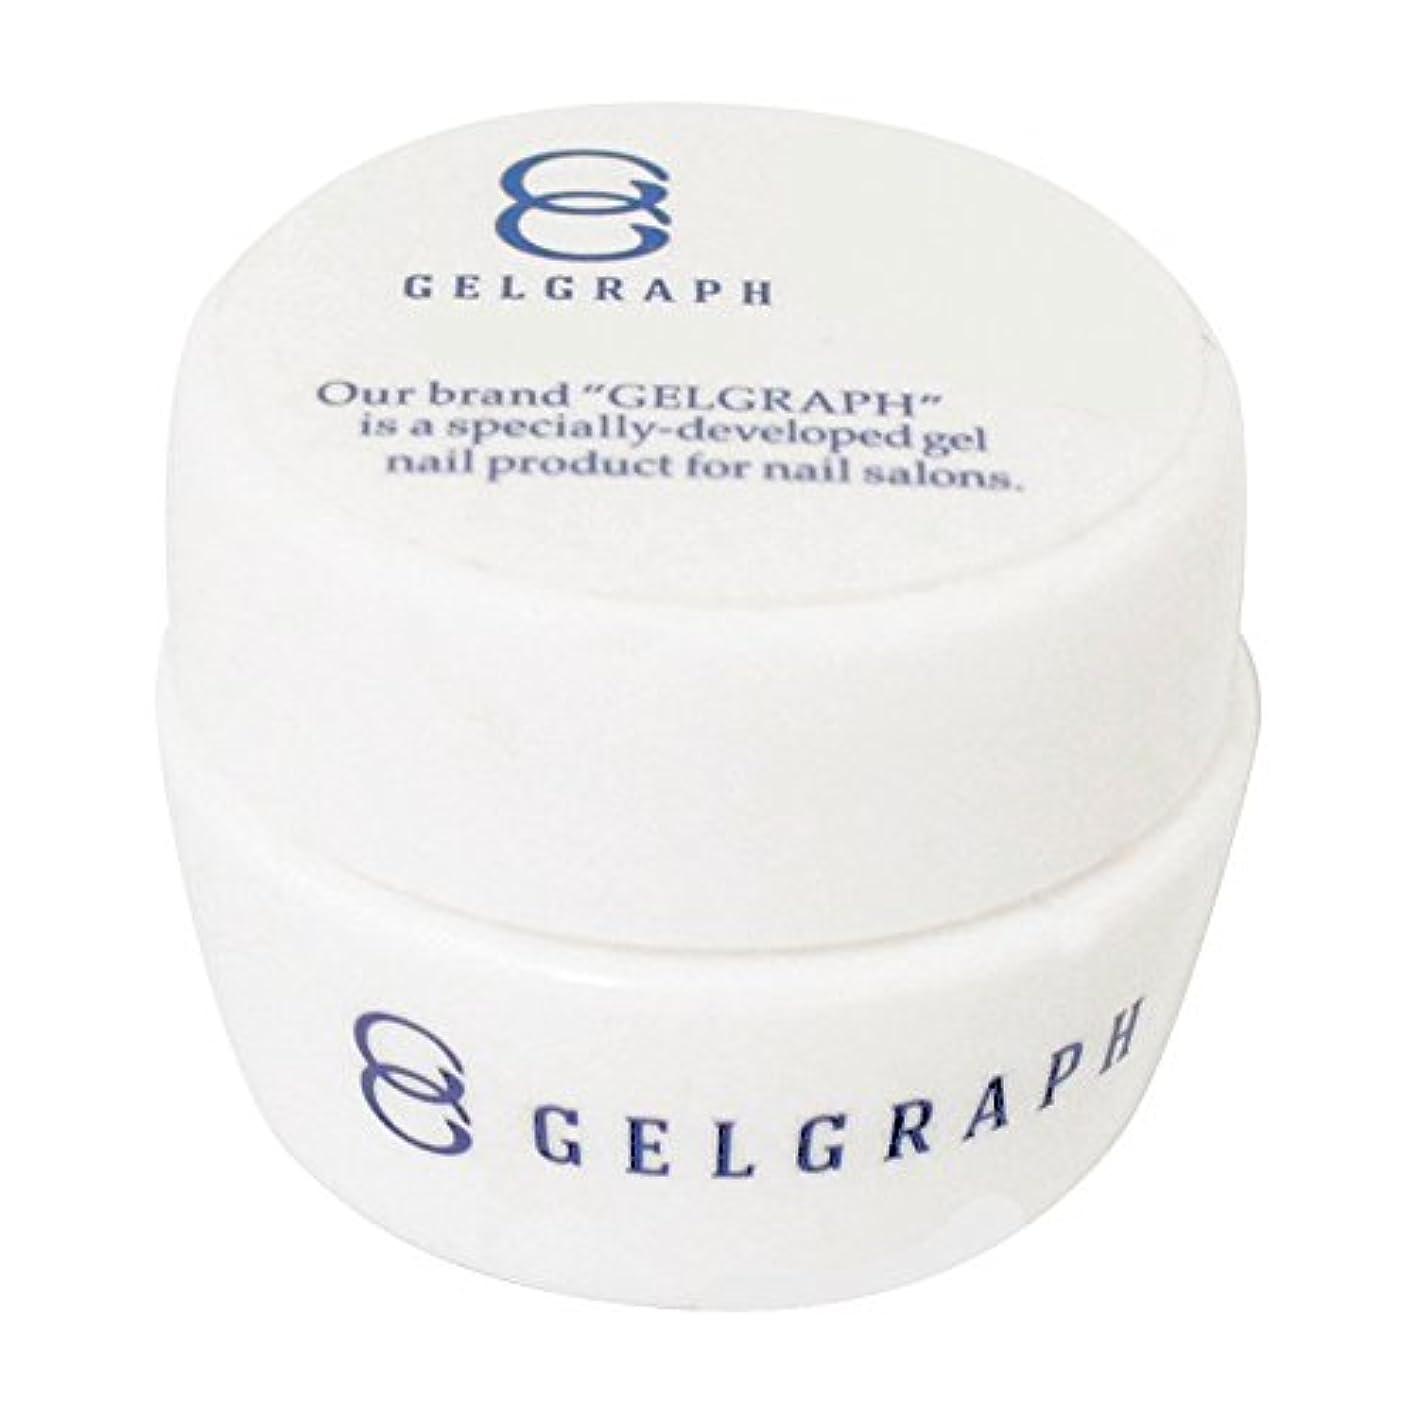 GELGRAPH カラージェル 080N ピンク?キャデラック 5g UV/LED対応 ソークオフジェル